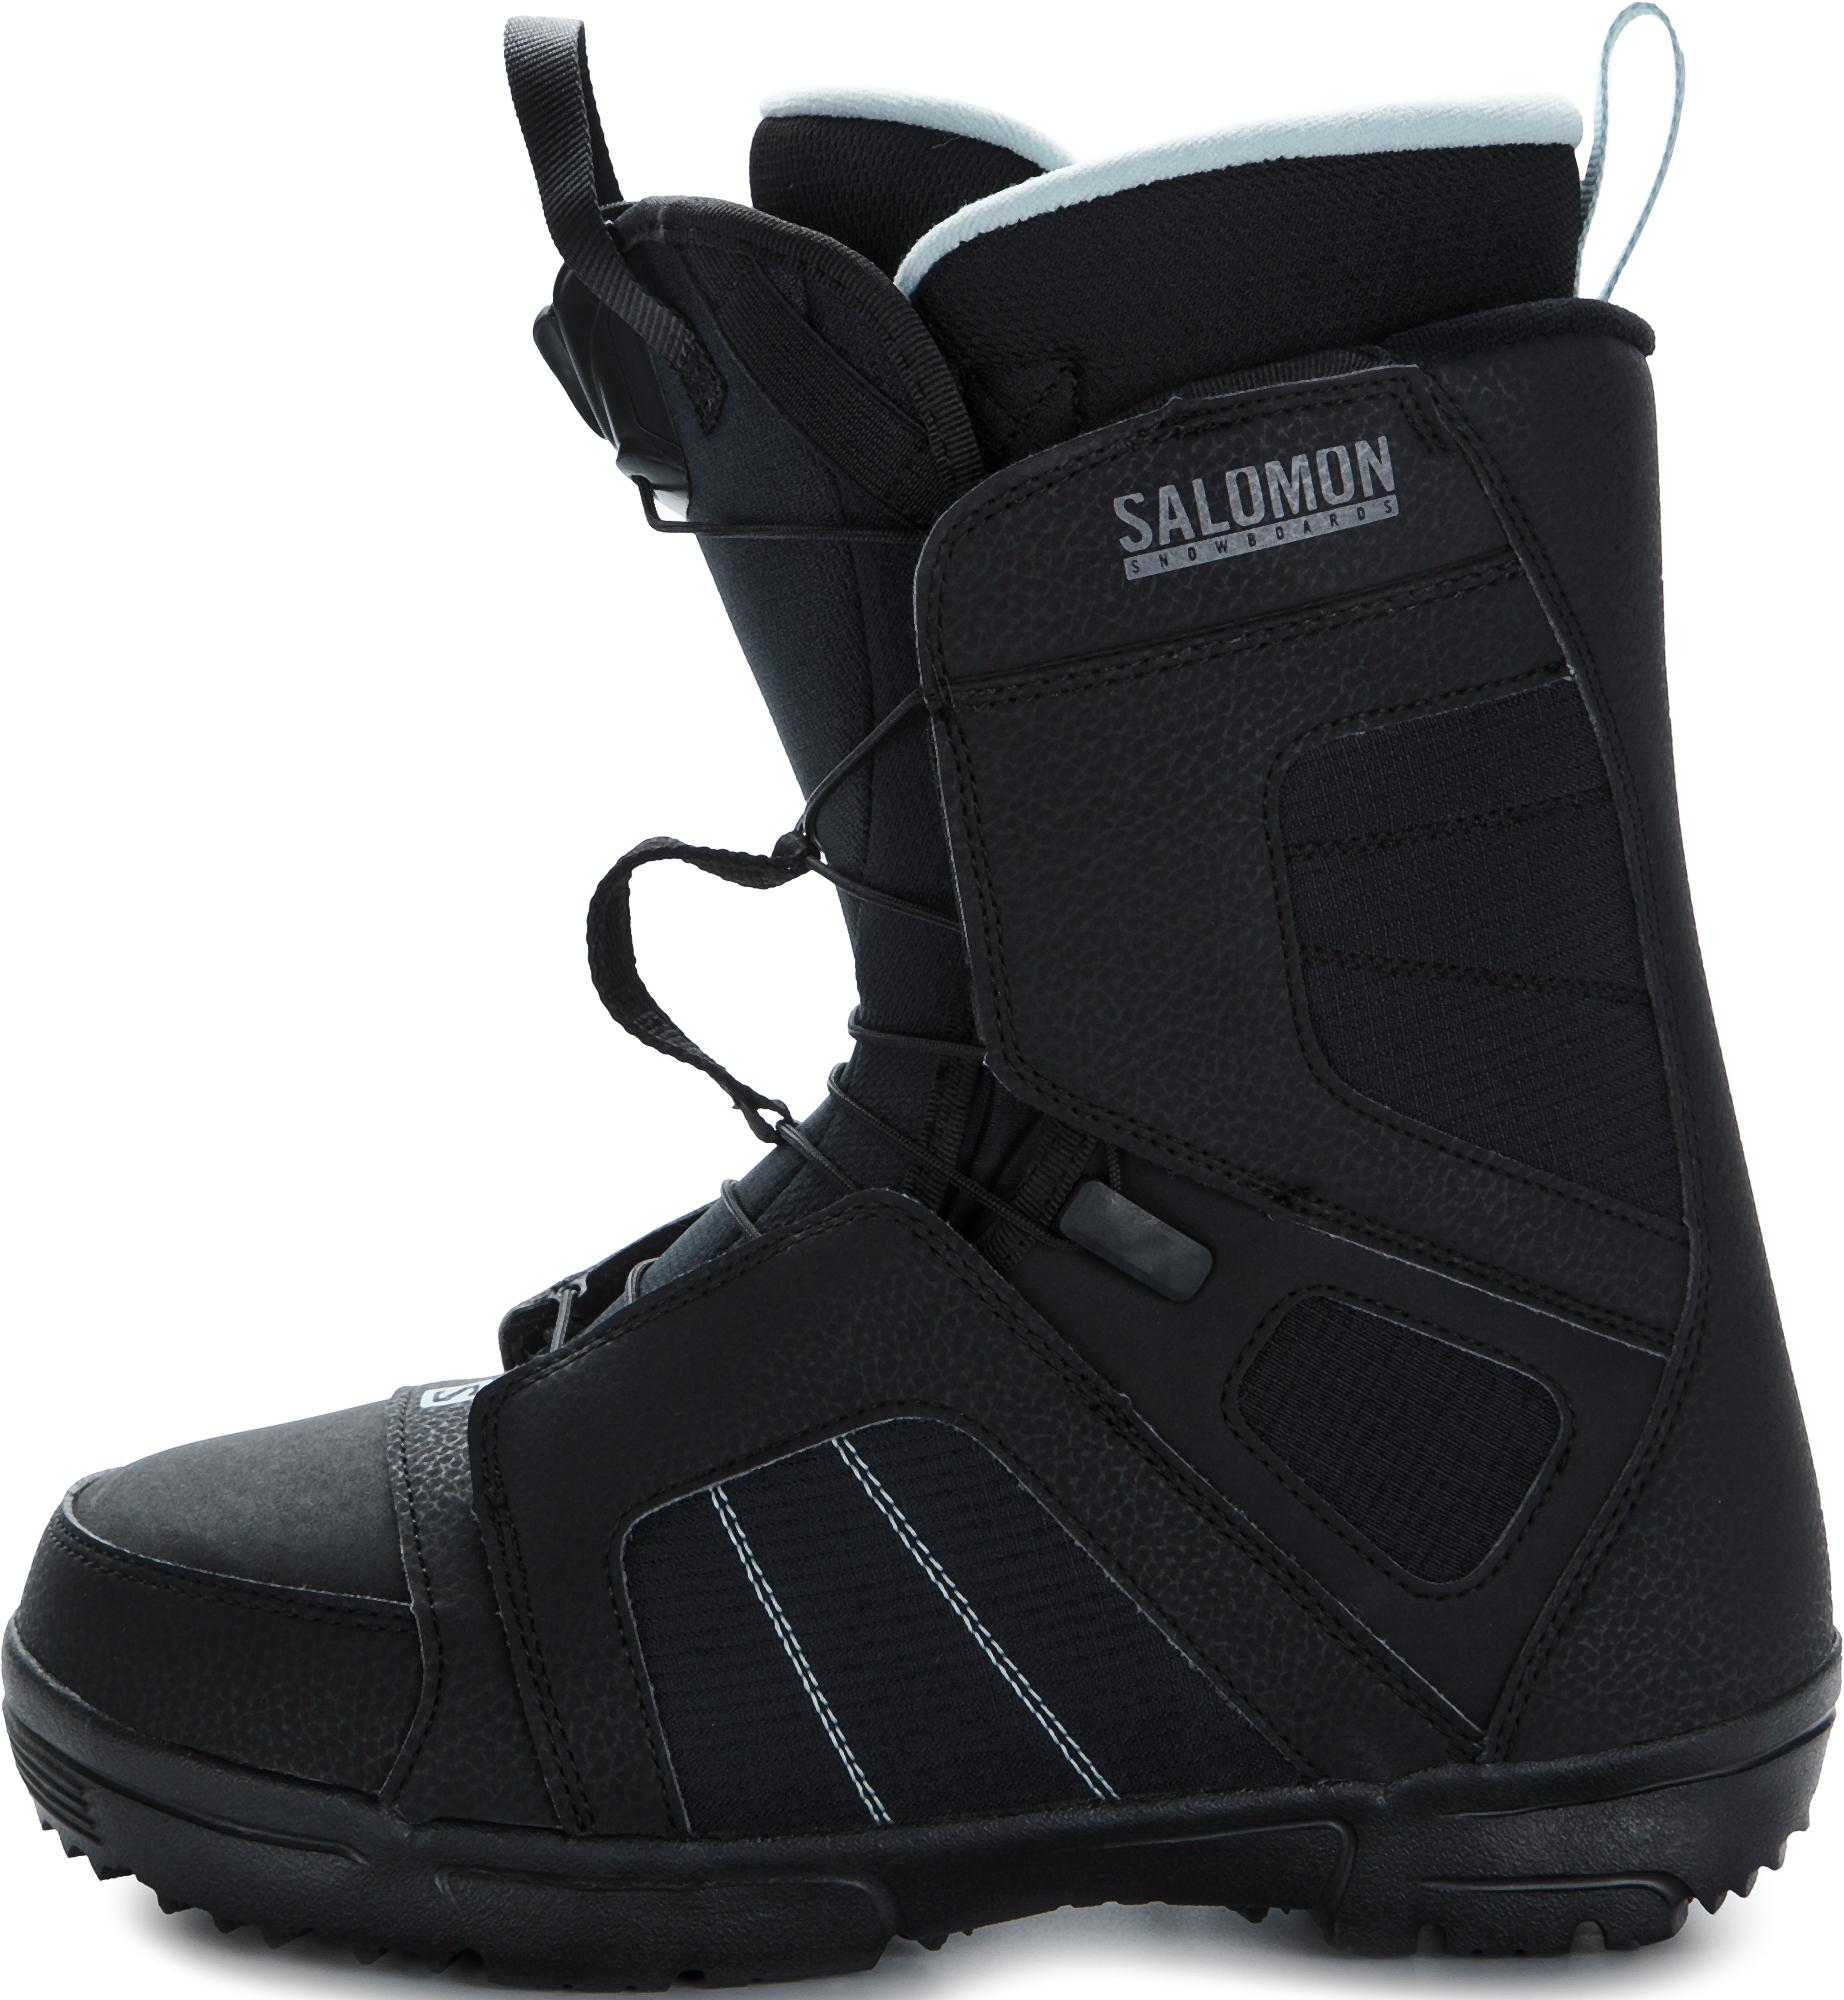 Salomon SCARLET, размер 39 цена